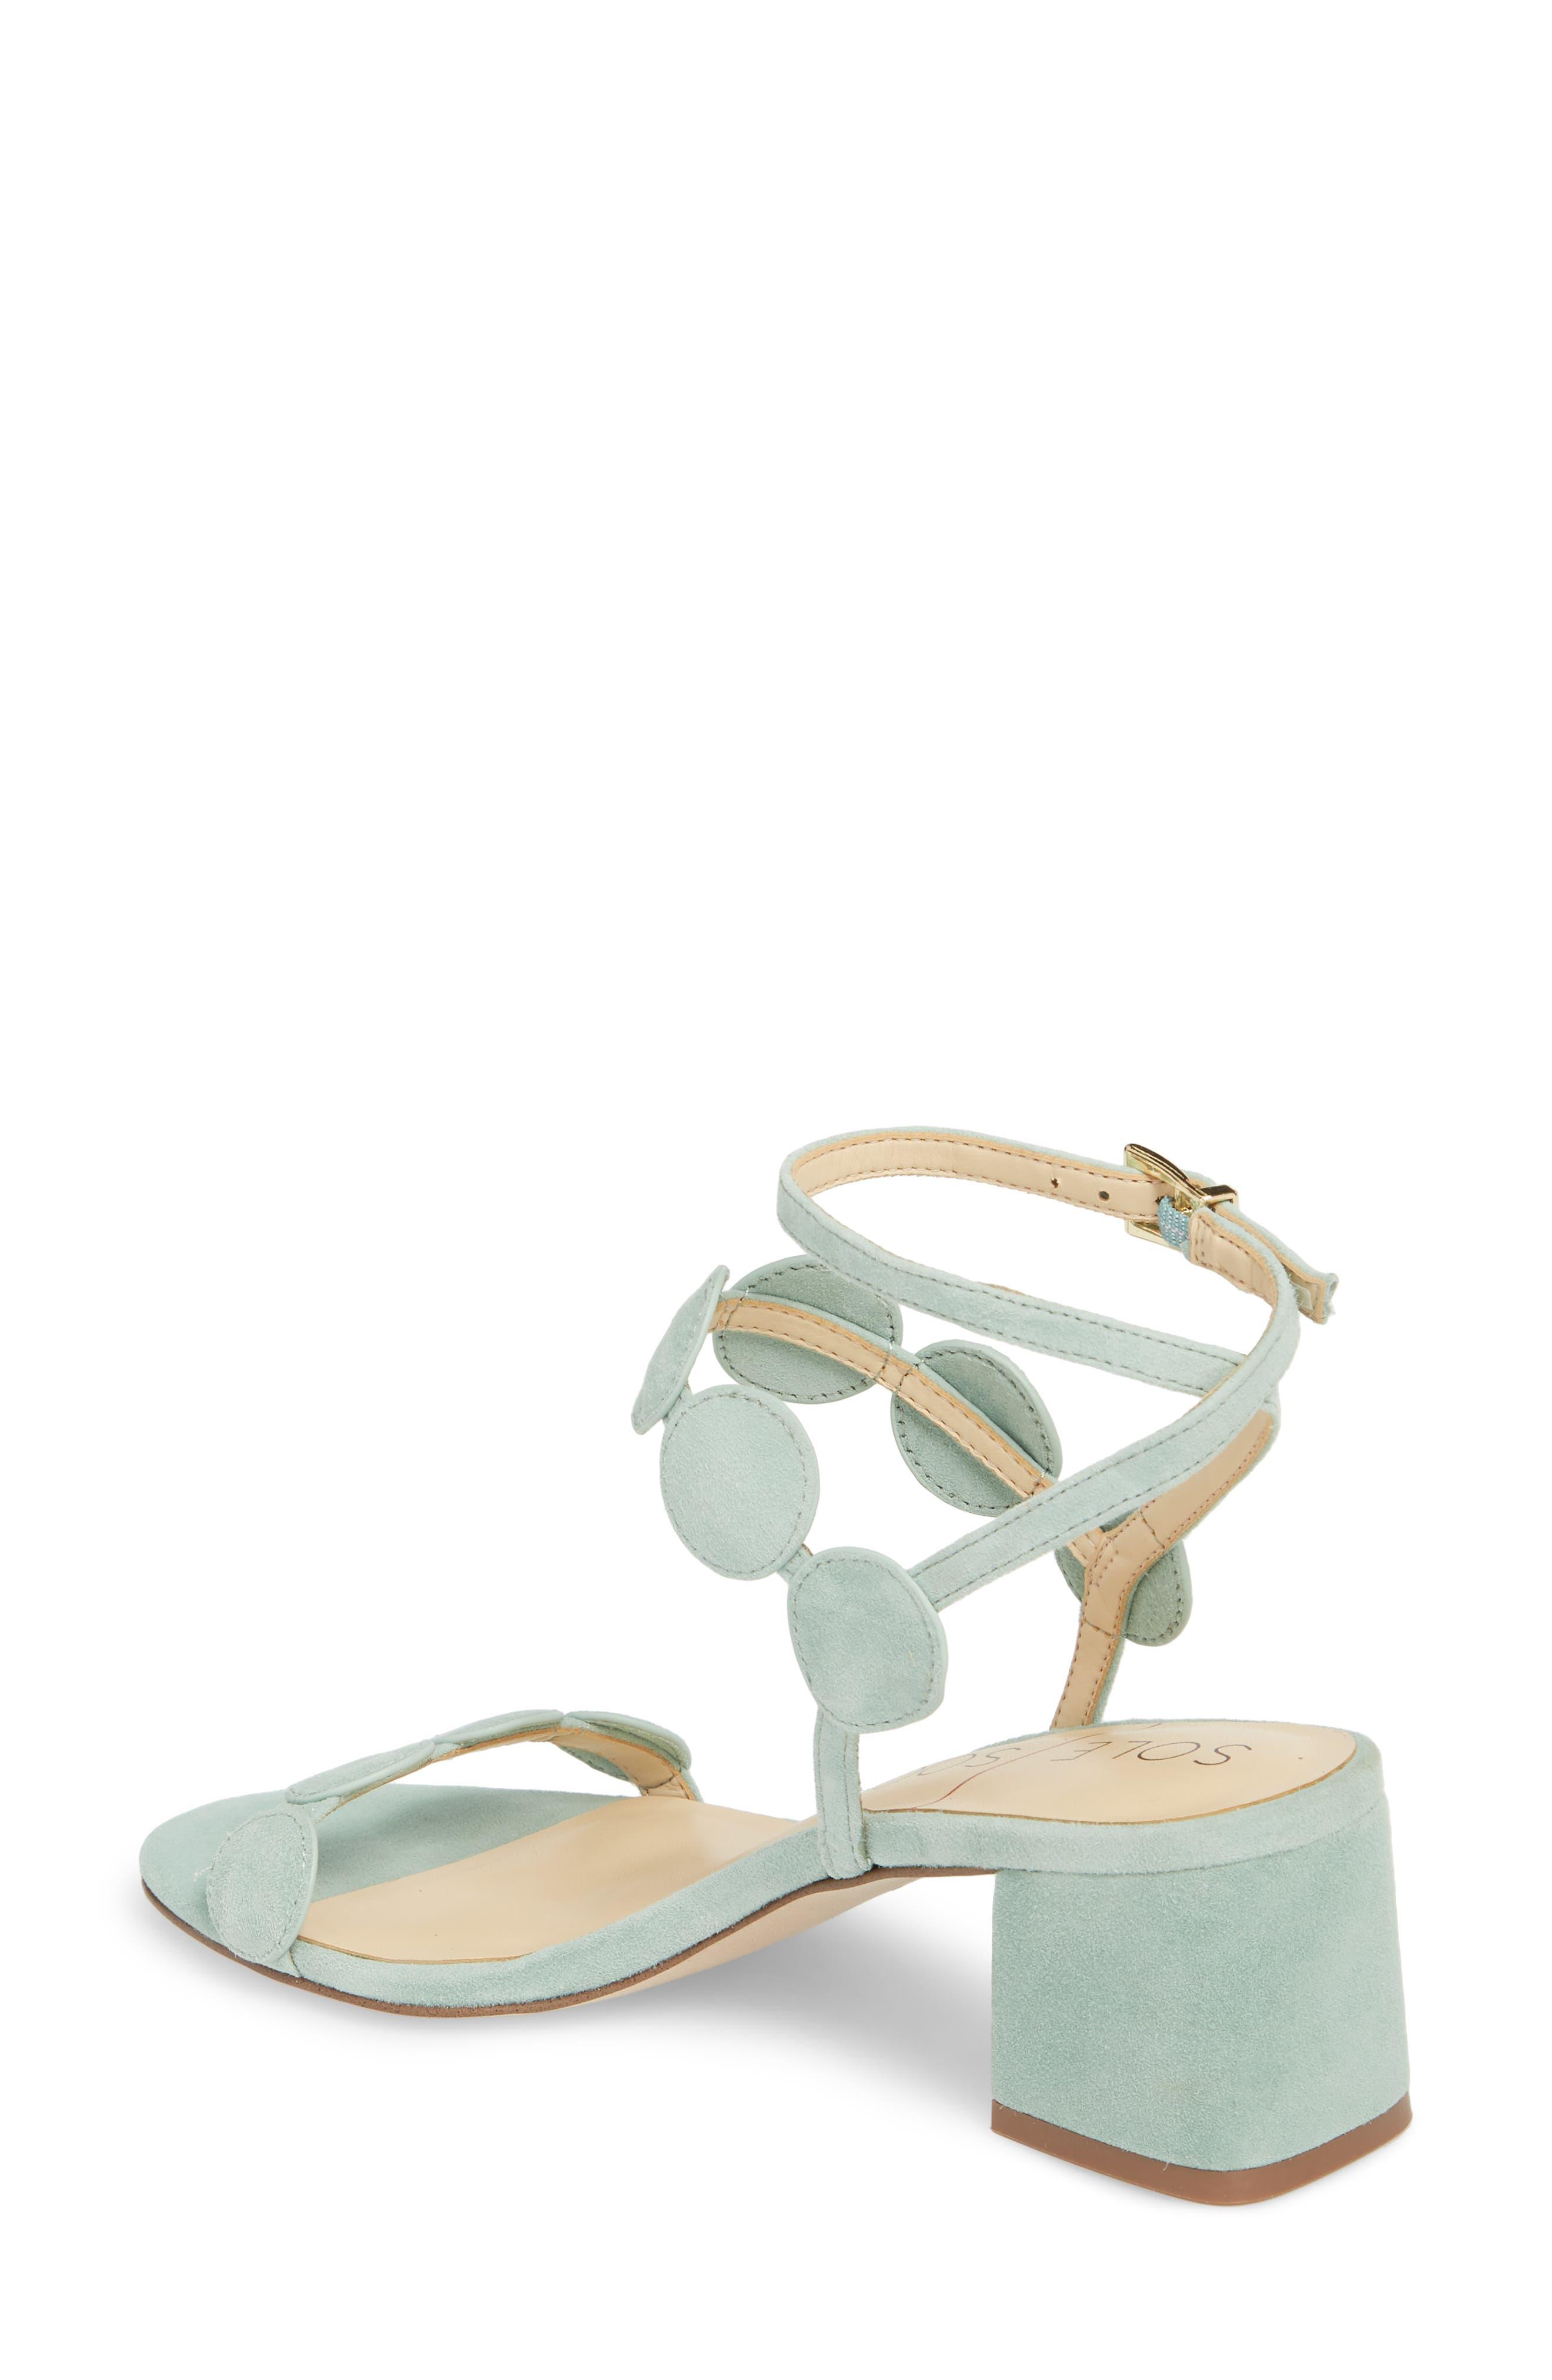 Shea Block Heel Sandal,                             Alternate thumbnail 2, color,                             Sage Green Suede